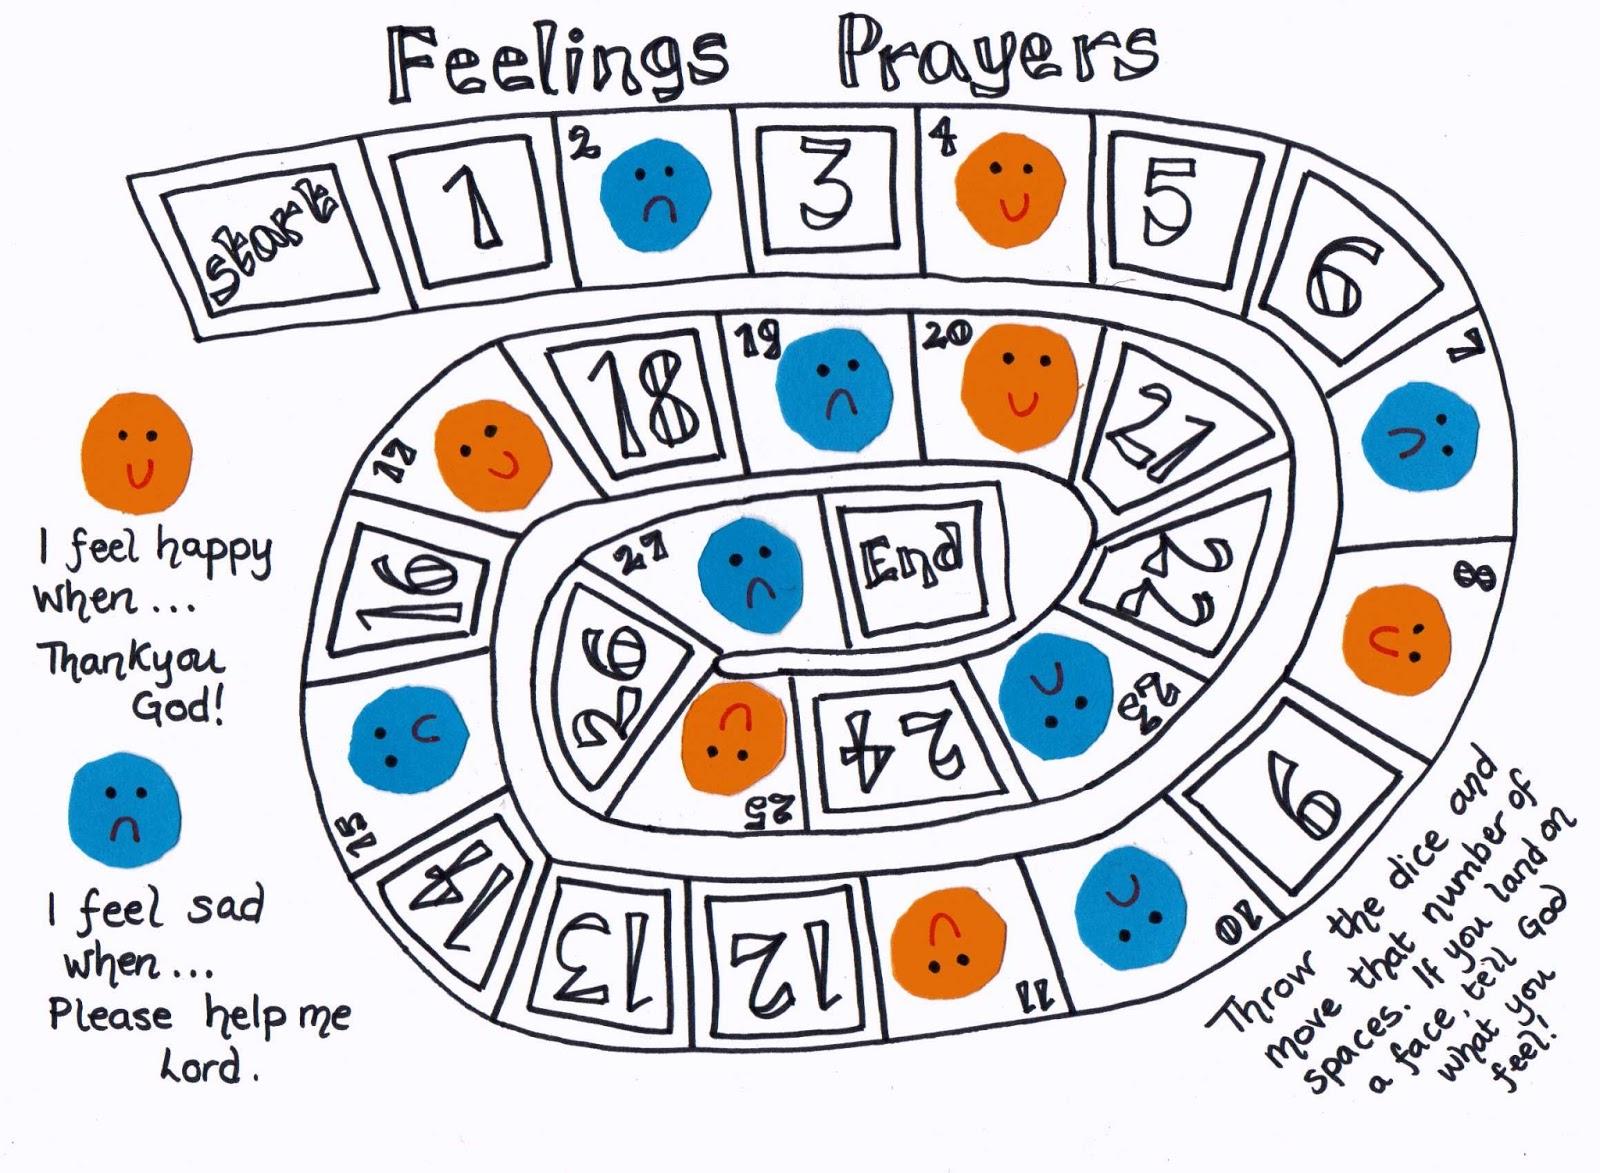 flame creative children u0027s ministry feelings prayer game a way